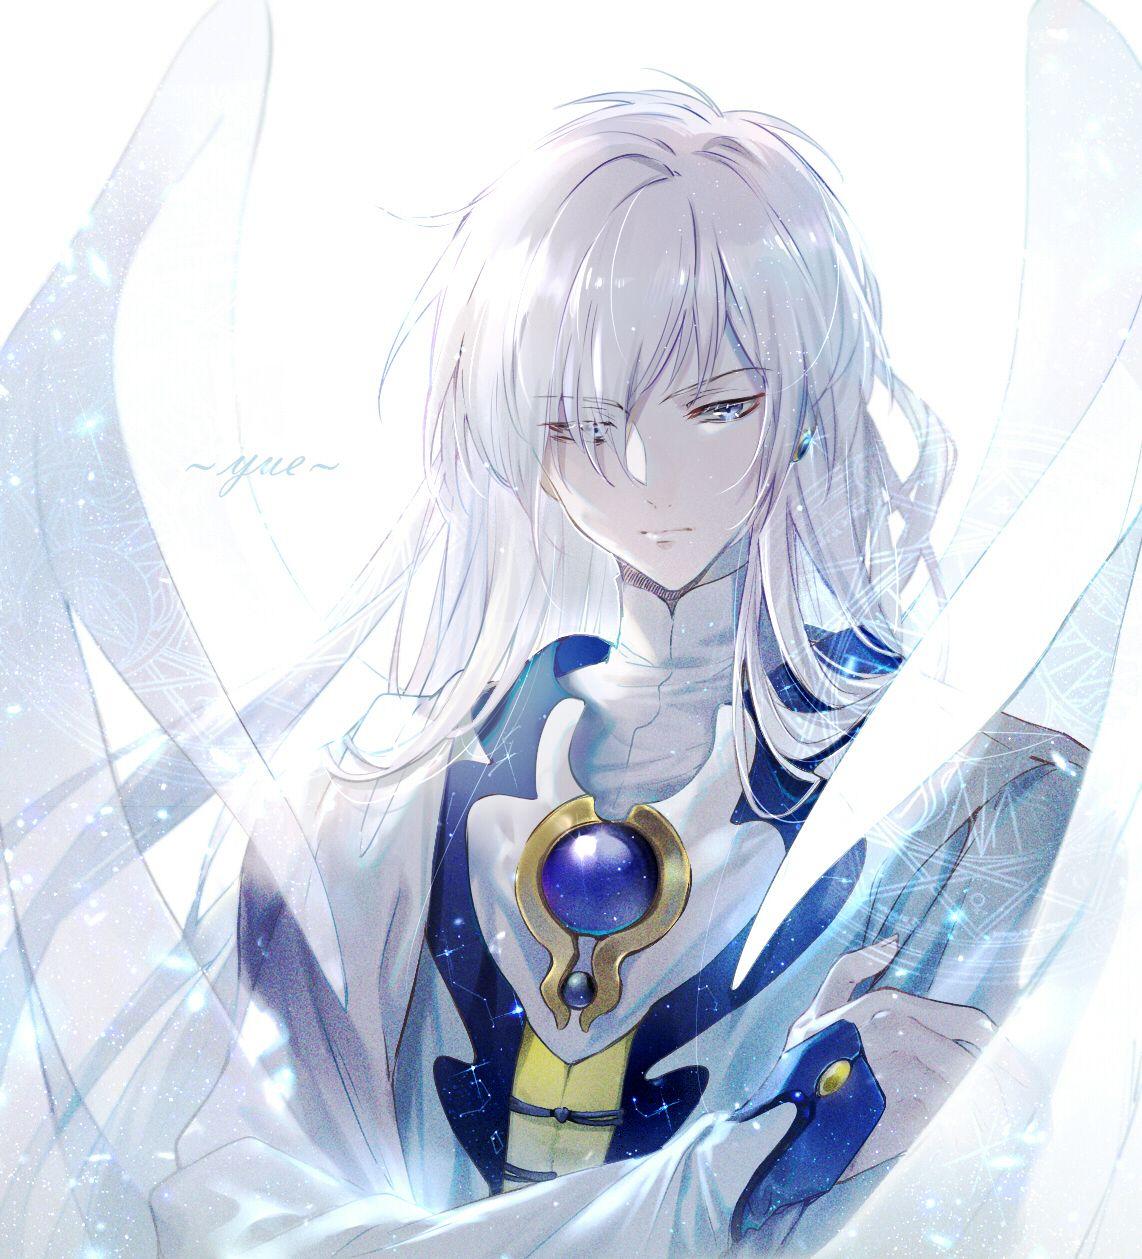 Dessin Ange Realiste card captor sakura   sakura chasseuse de cartes, ange anime